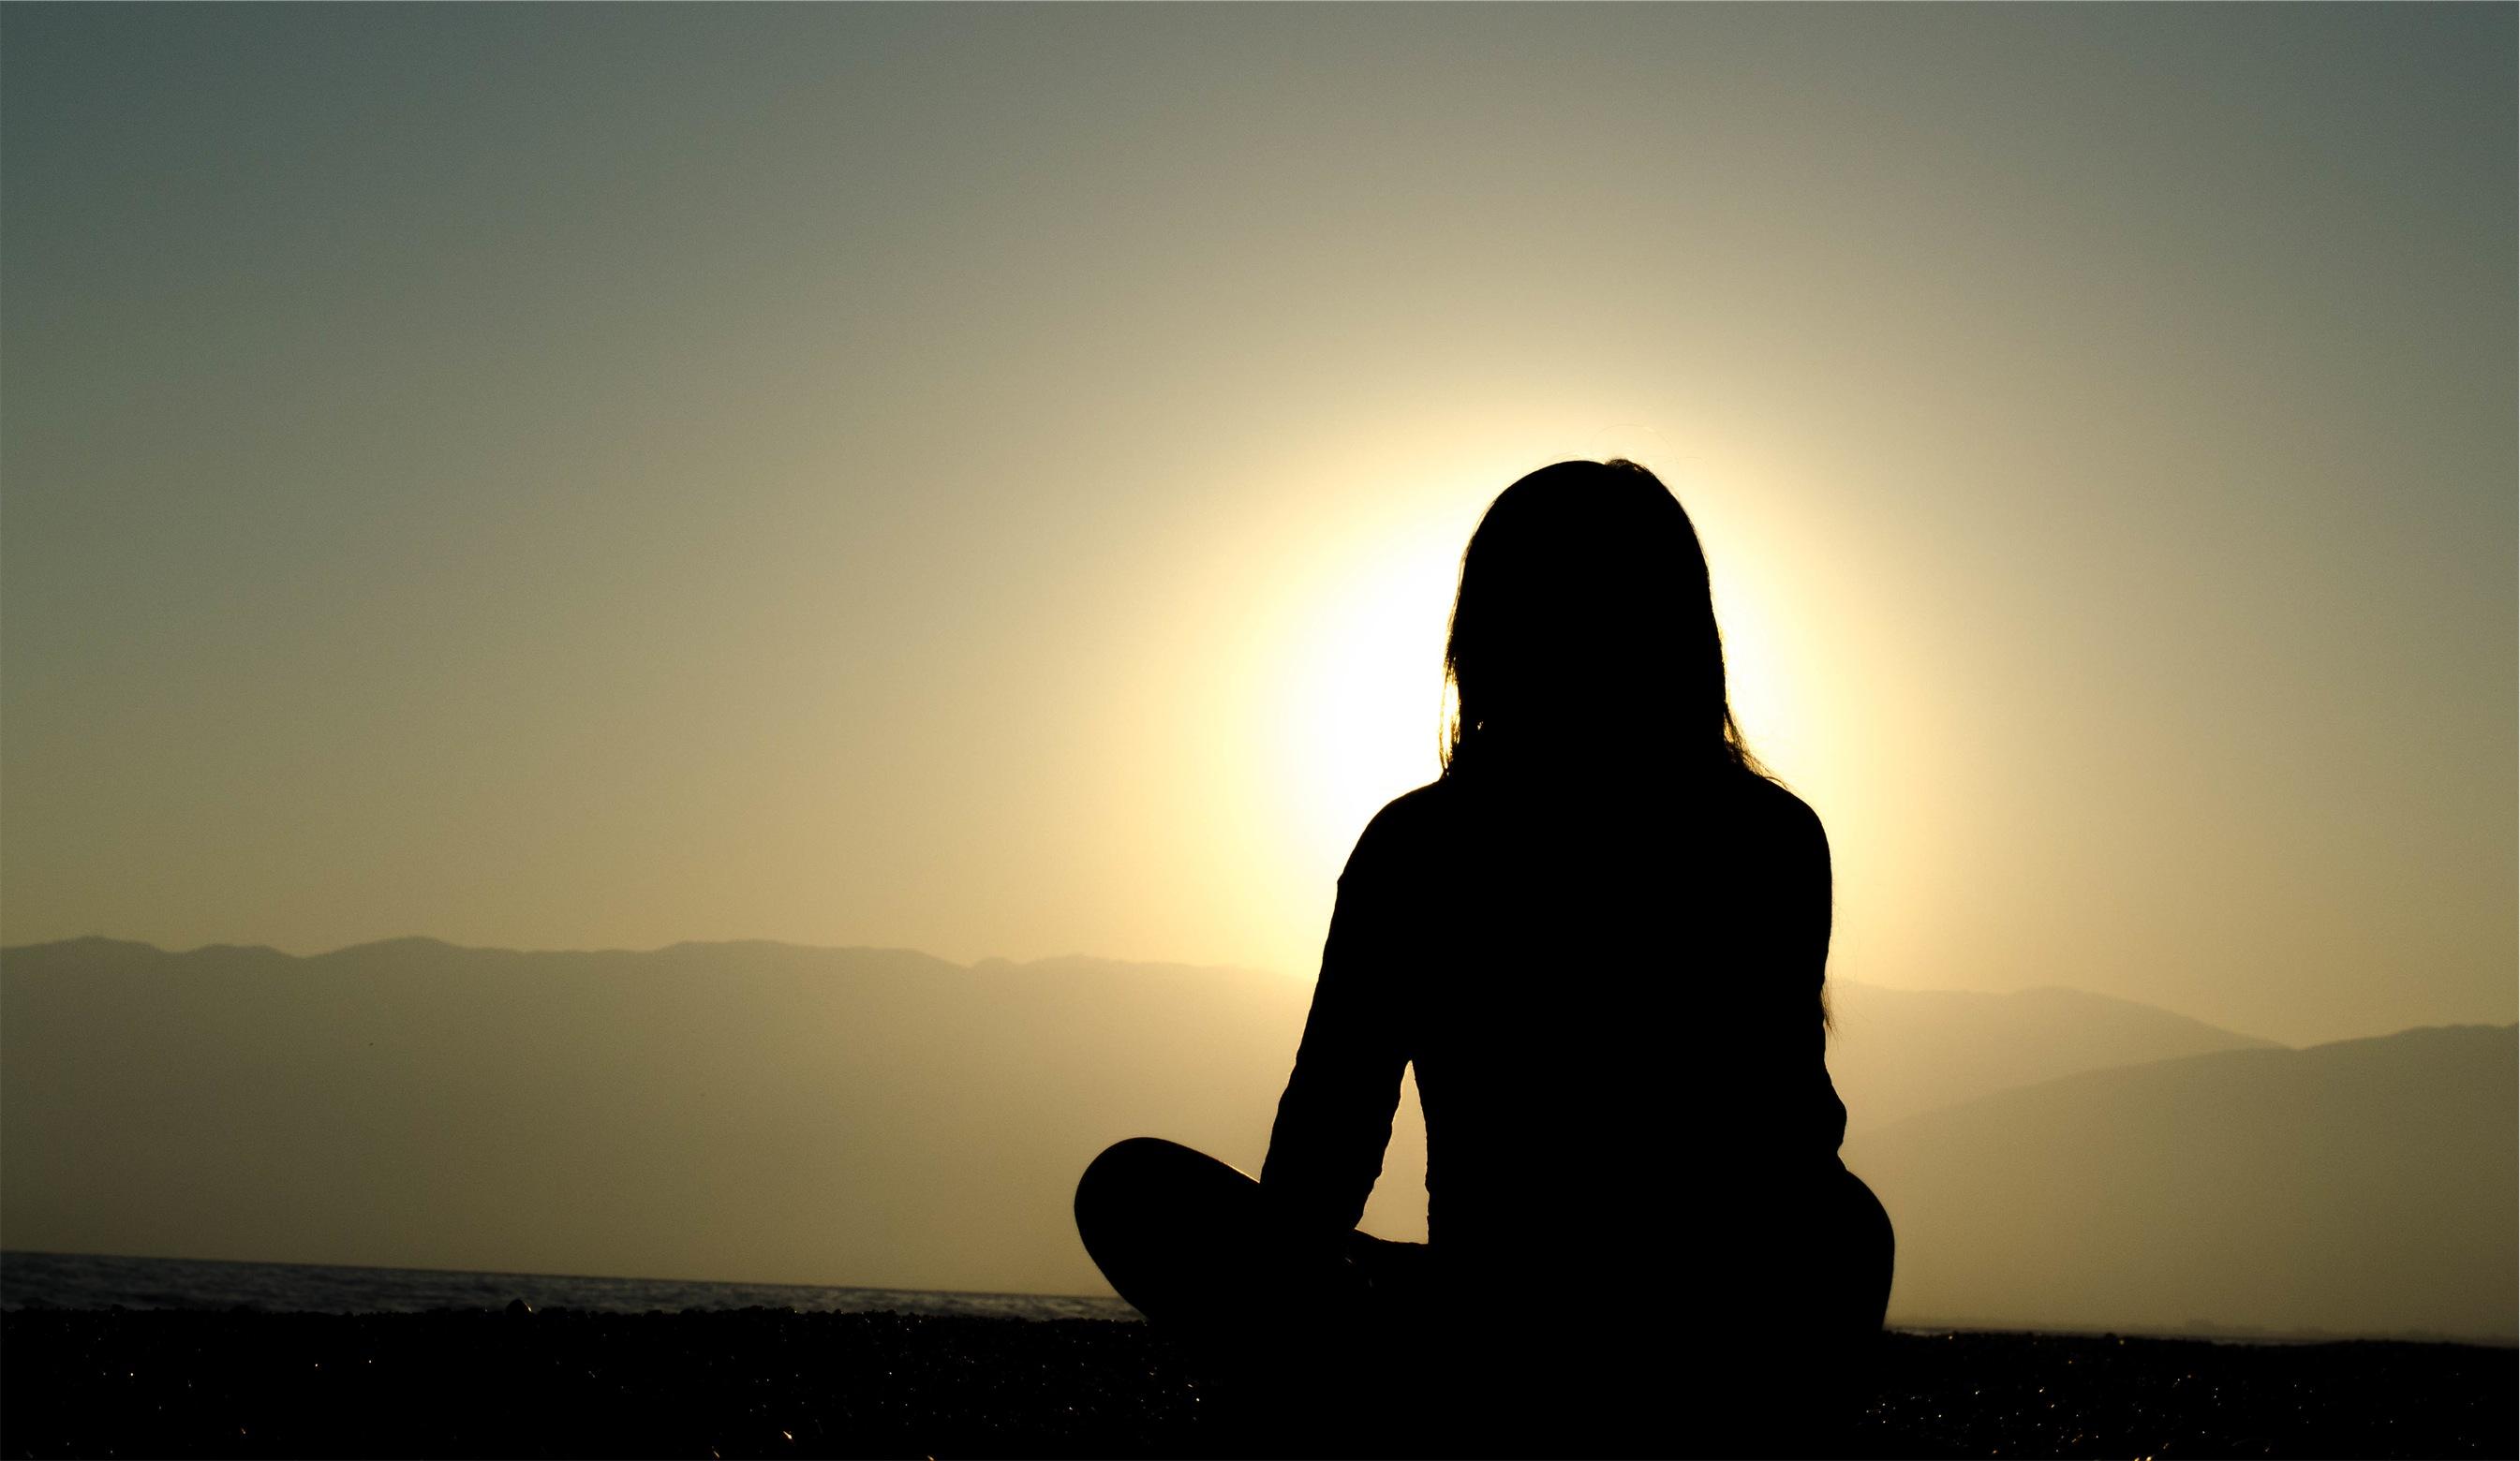 meditating yoga meditation healthy fitness health thanksgiving maintain don't gain